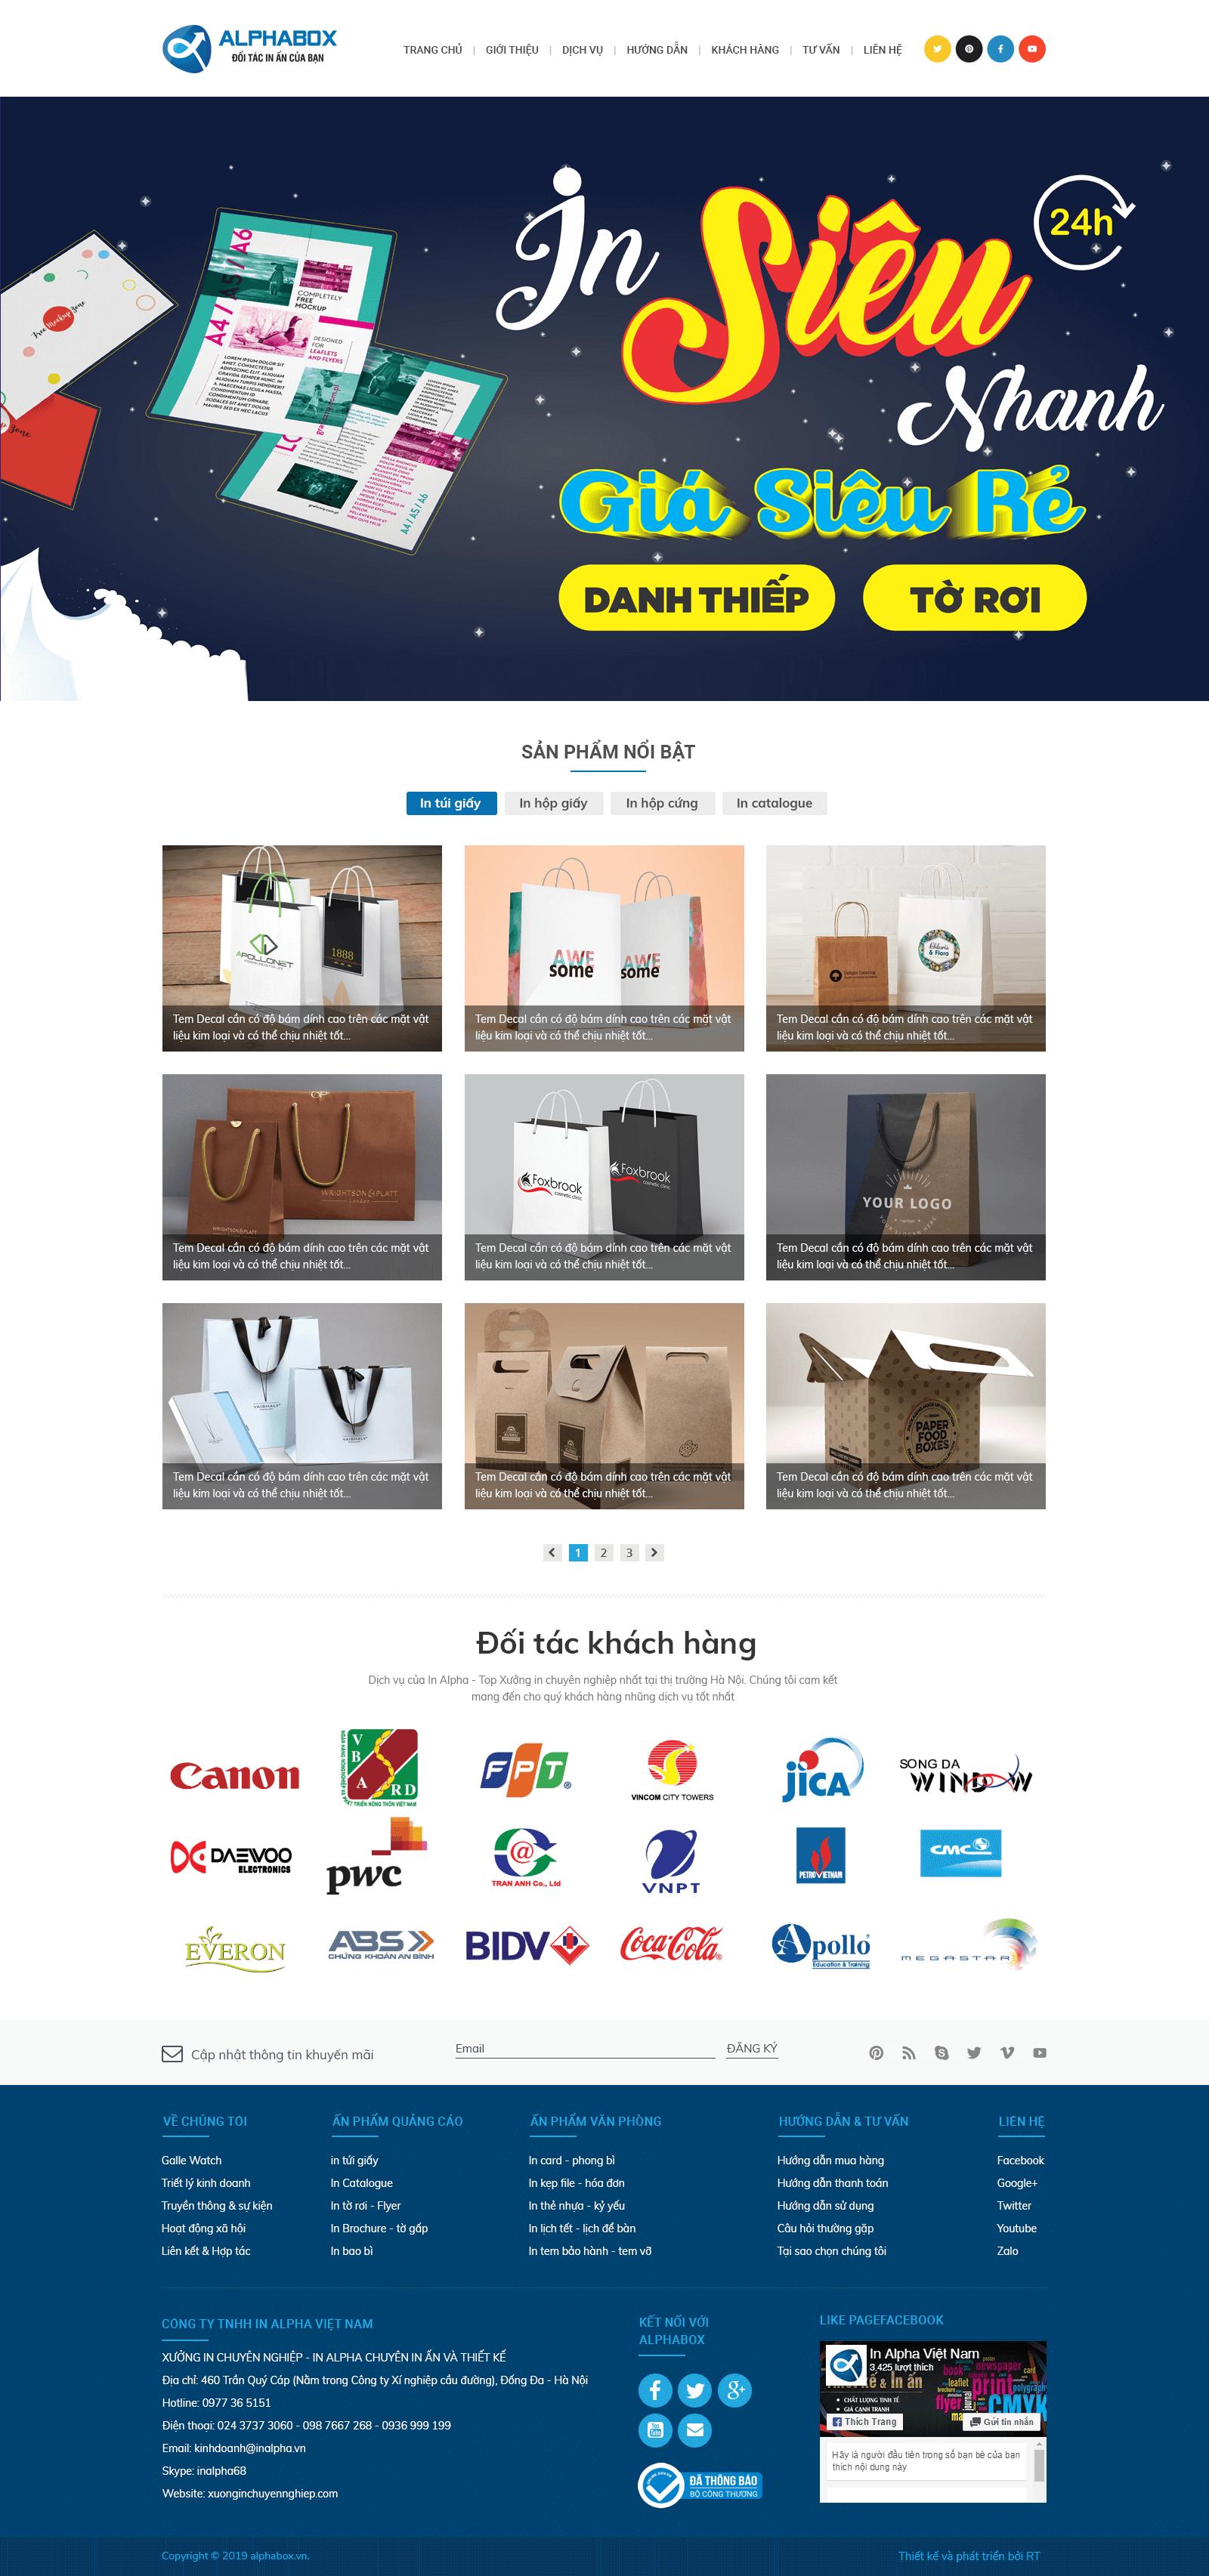 Website Anphabox RT